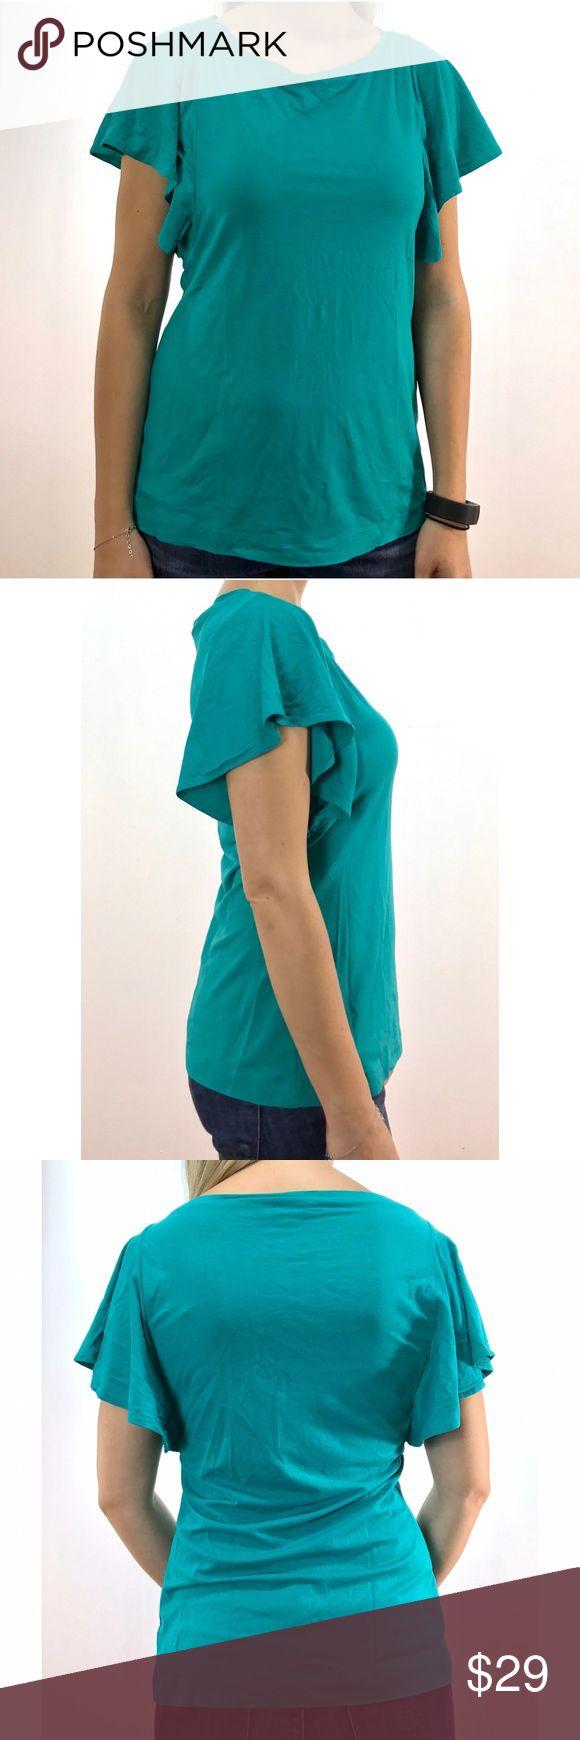 Banana Republic Stretch Teal Tshirt This preloved size S Stretch Teal tshirt features oversized short sleeves. Preloved items have normal wear and tear. 91% rayon; 9% spandex. Banana Republic Tops Tees - Short Sleeve